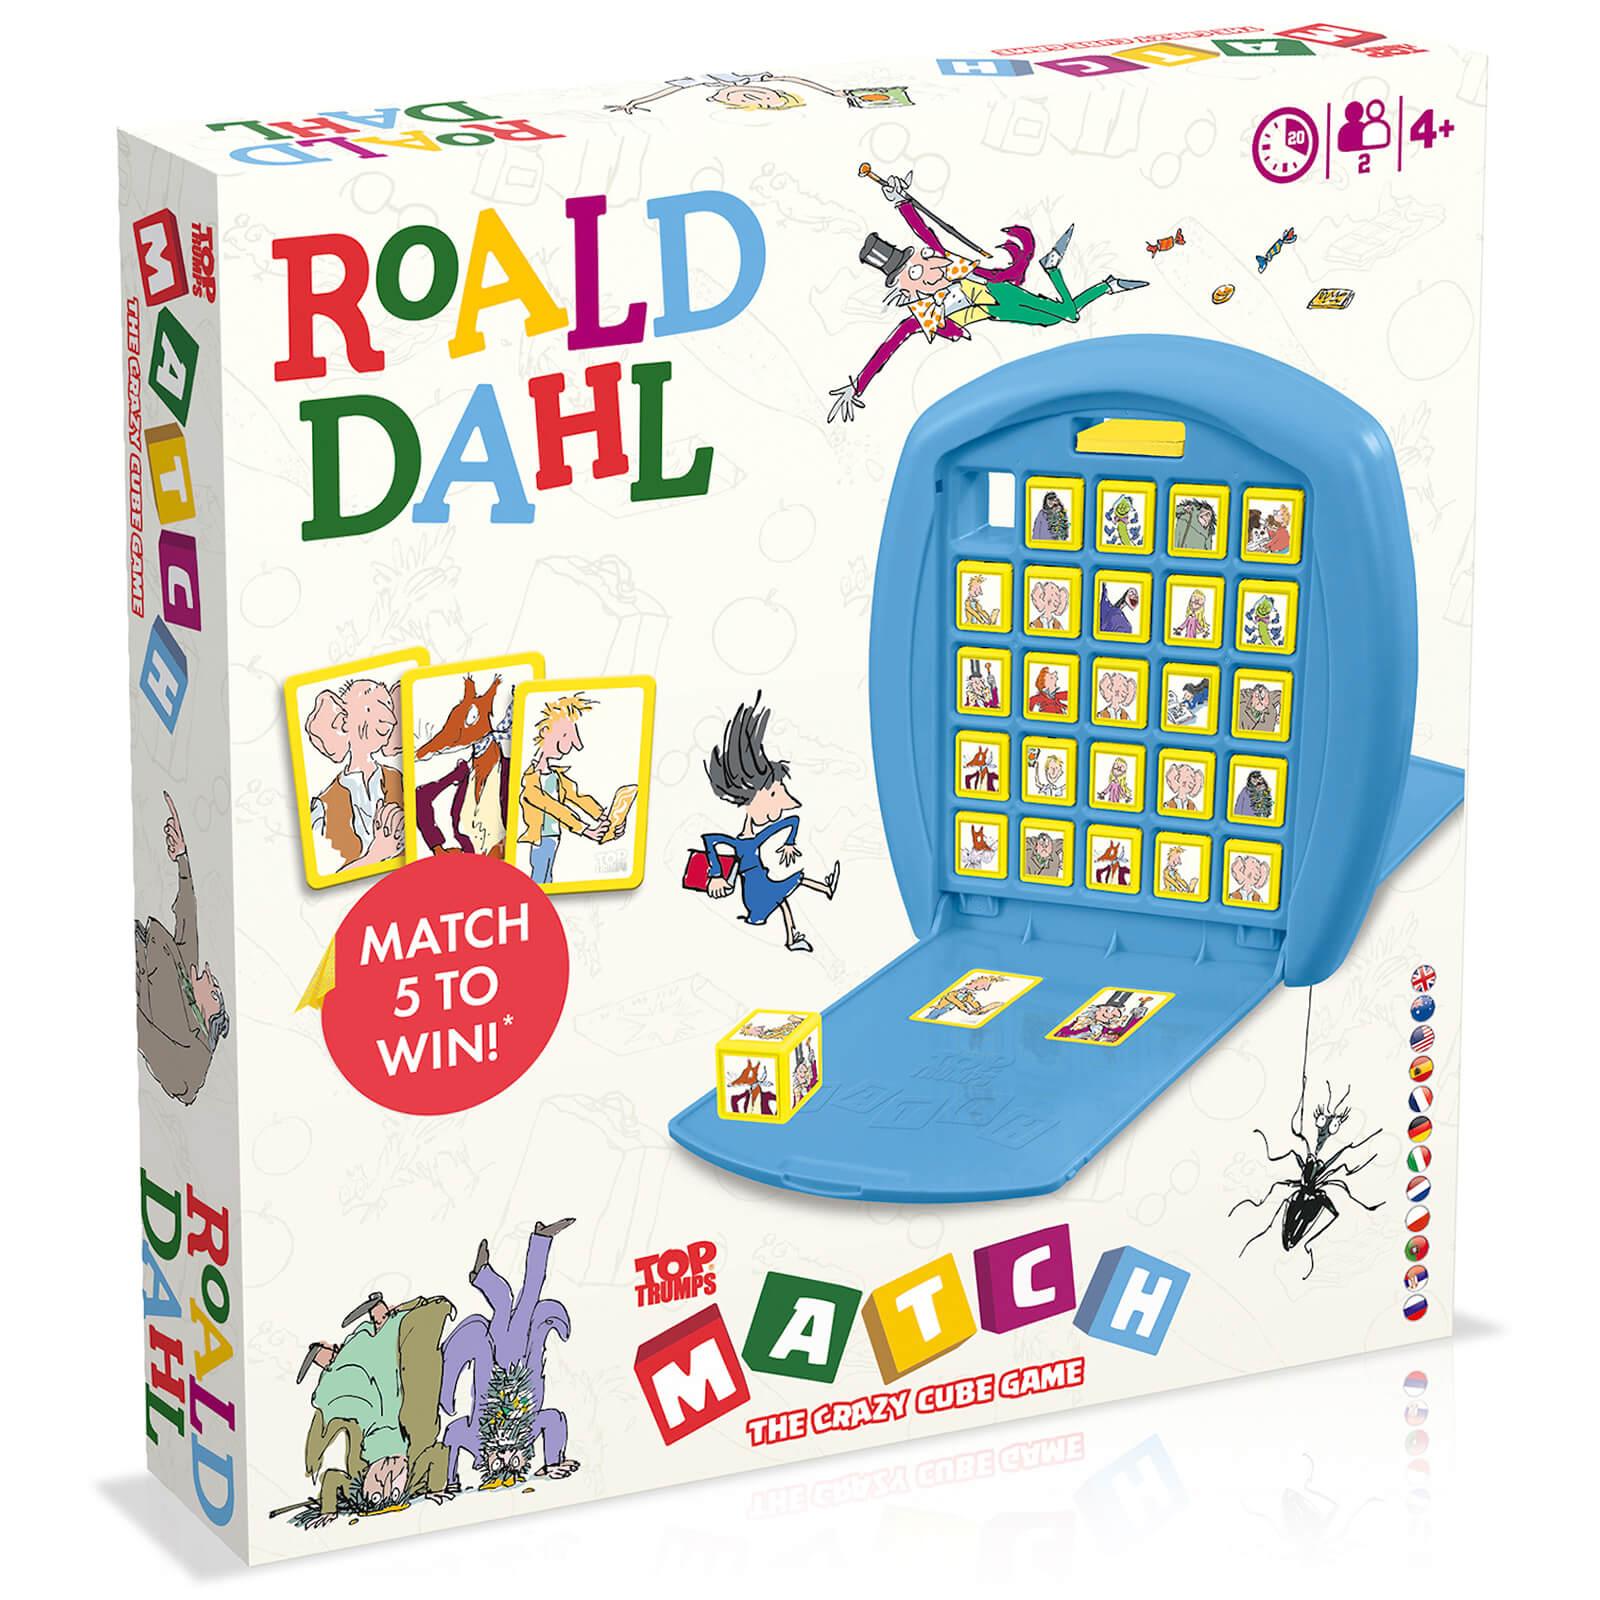 Top Trumps Match Board Game - Roald Dahl Edition-unisex